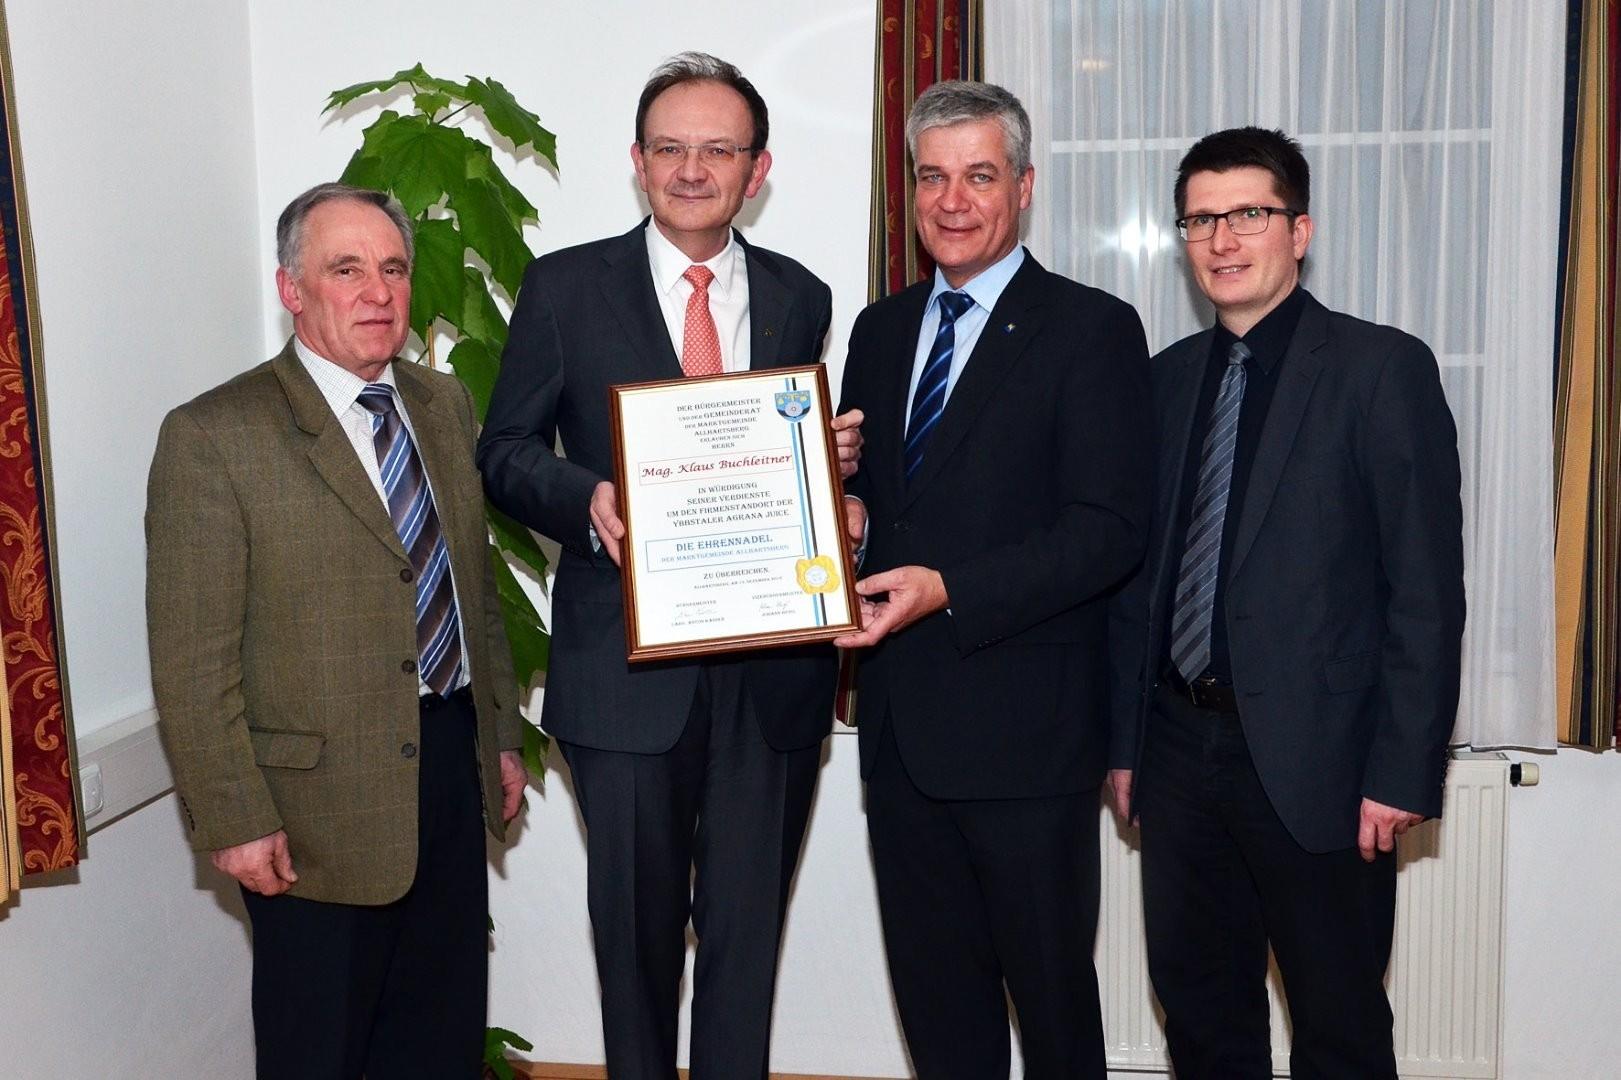 Allhartsberg-Ehrung-Buchleitner-3903.JPG